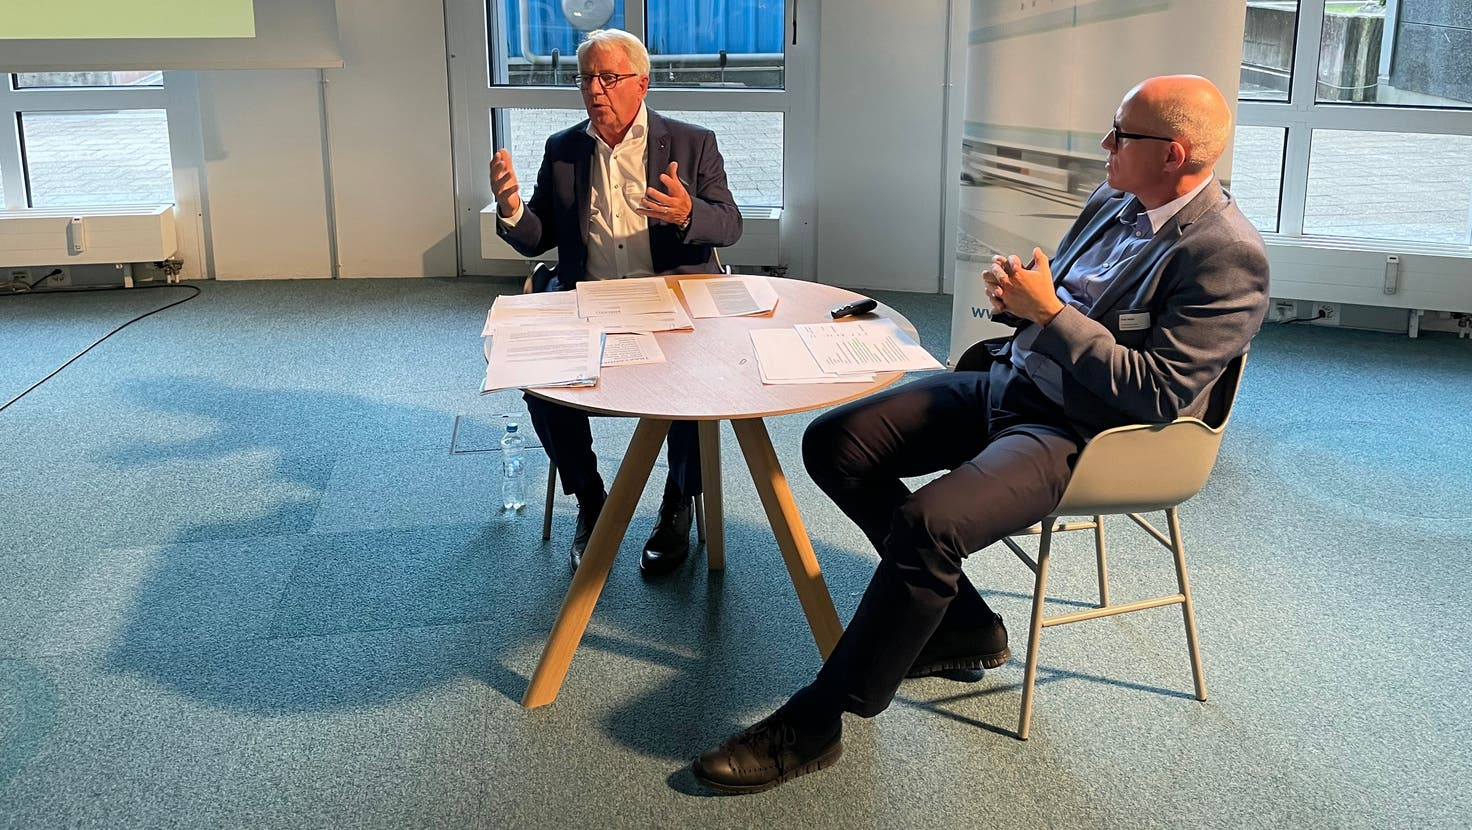 IG-Silbern-Präsident Urs Jenny und Gebietsmanager Dieter Beeler präsentierten den Geschäftsbericht als lockeres Gespräch. (Florian Schmitz / Limmattaler Zeitung)